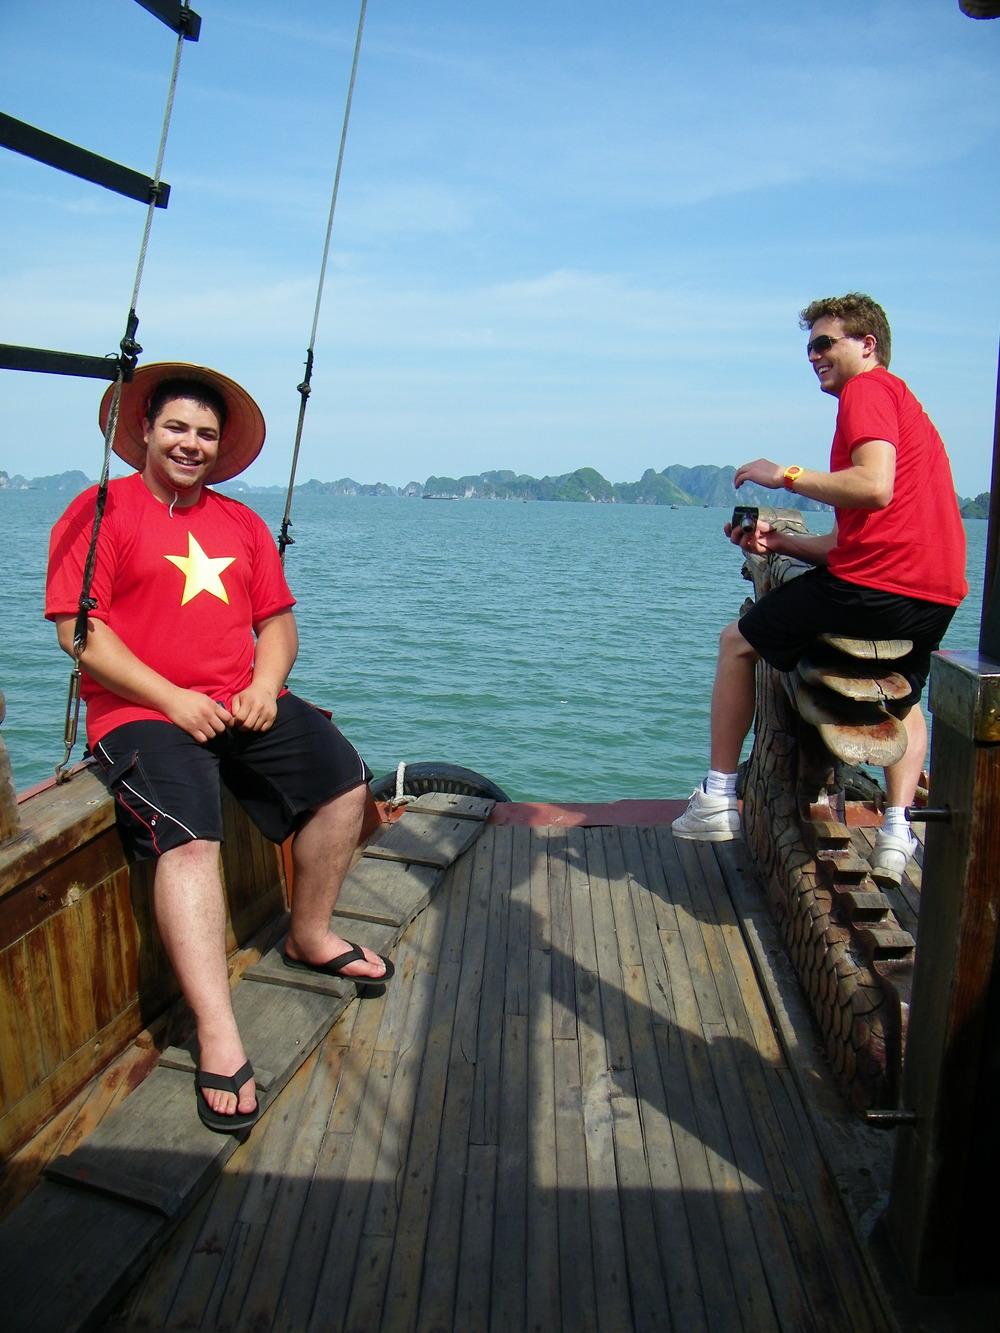 Captain Filali & First Mate Comadena in Ha Long Bay